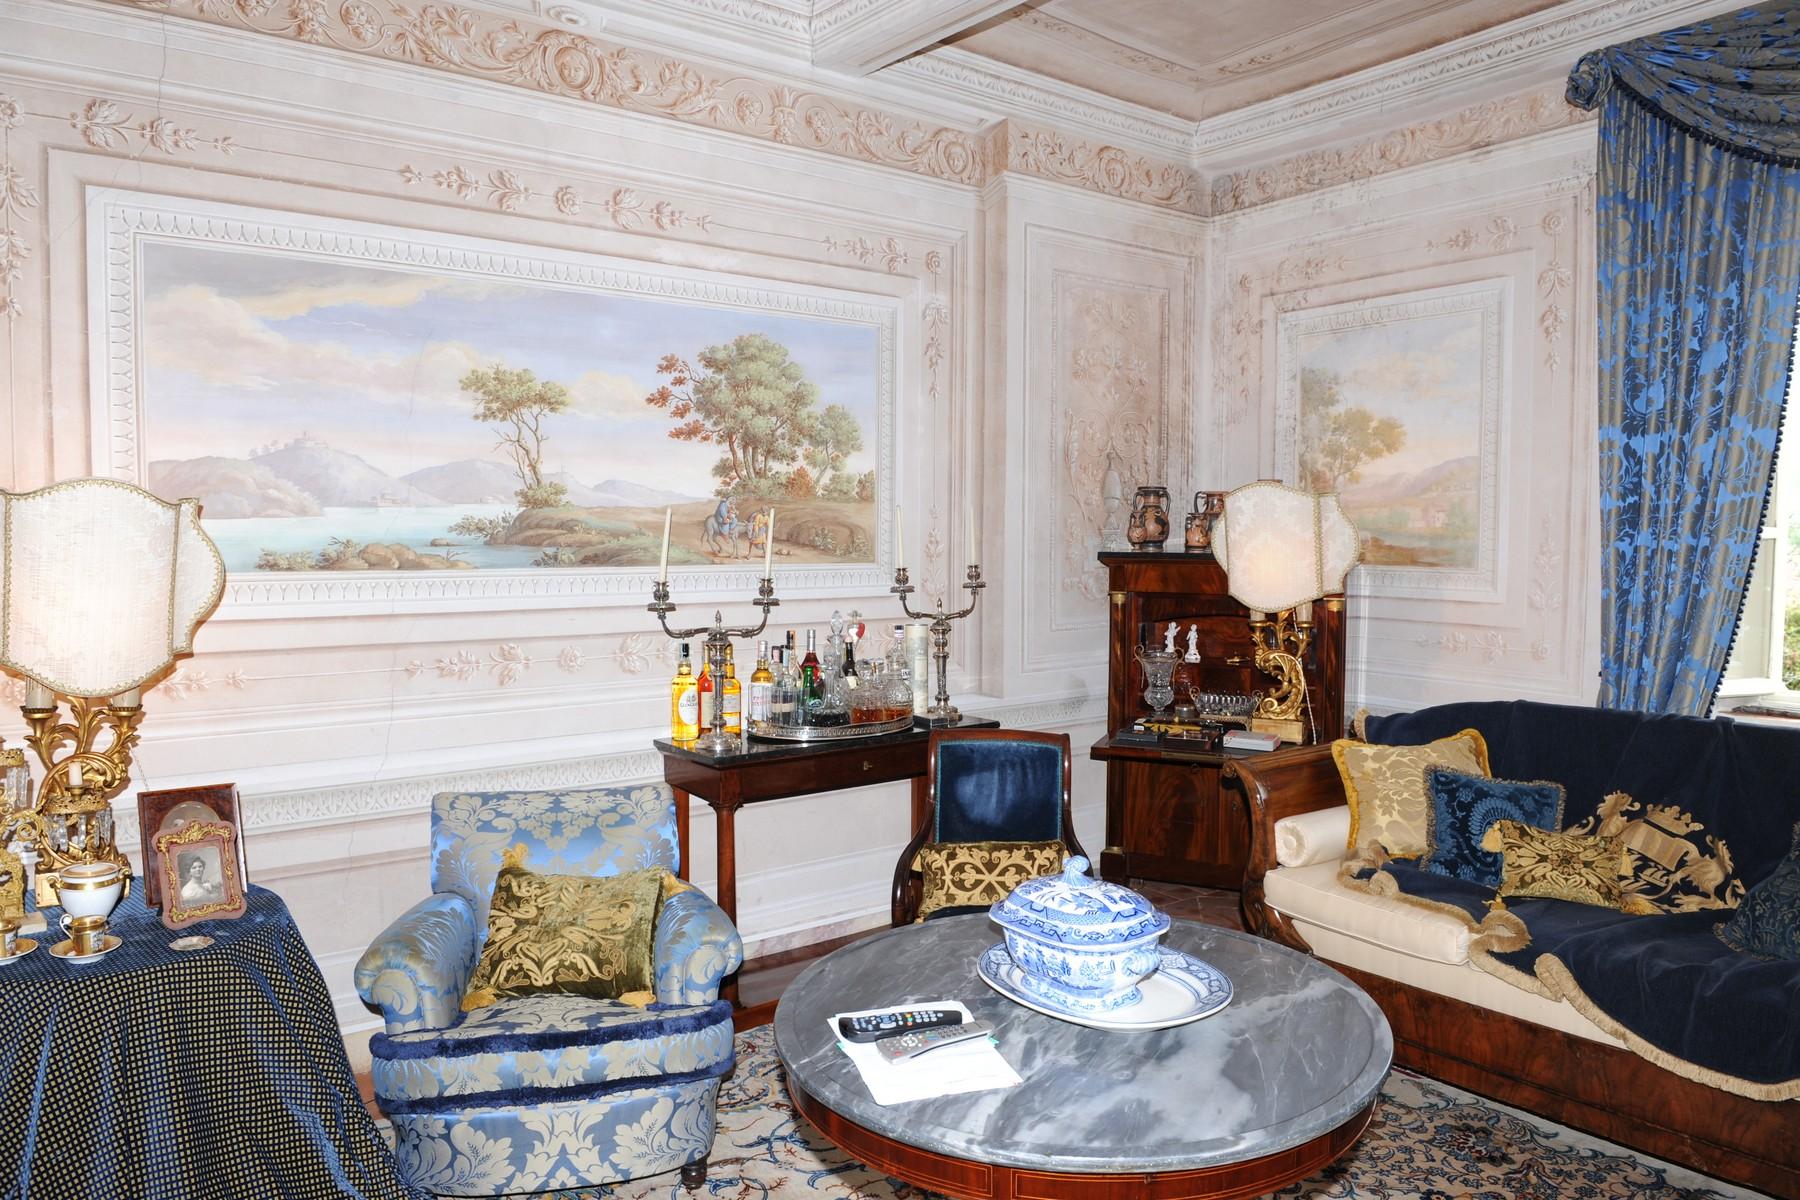 Villa in Vendita a Camaiore: 5 locali, 900 mq - Foto 4